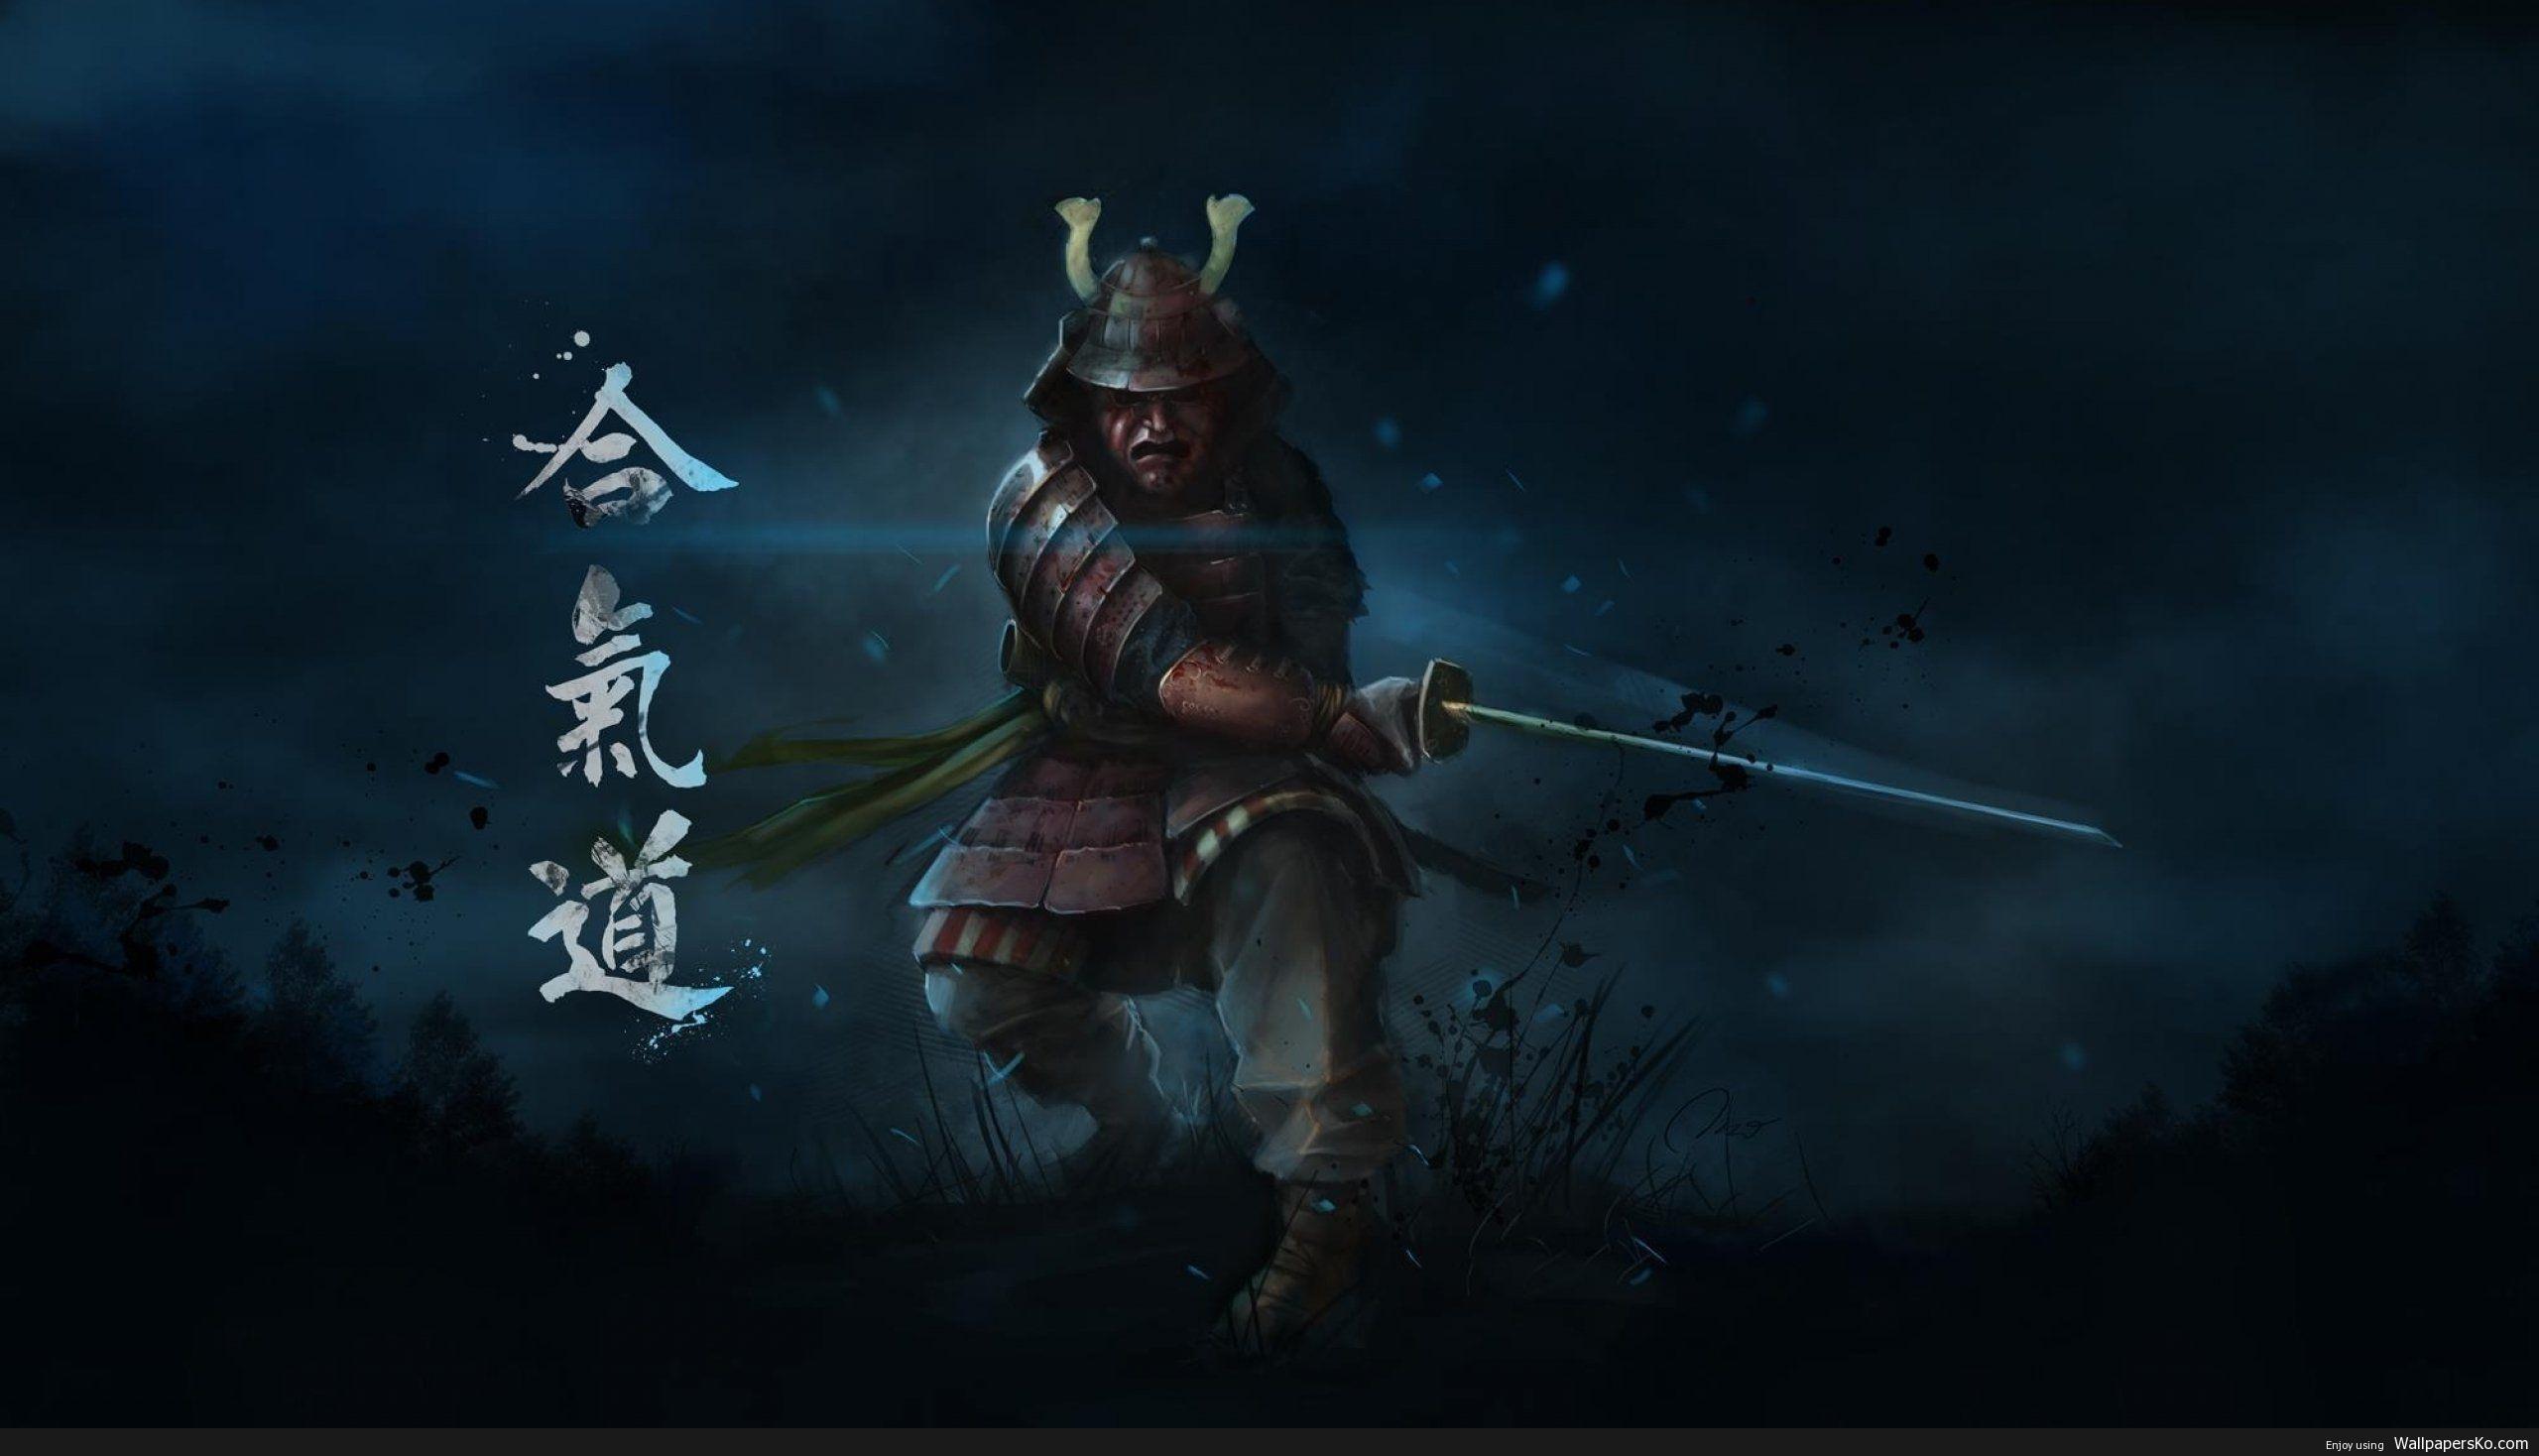 Samurai Warrior Wallpaper